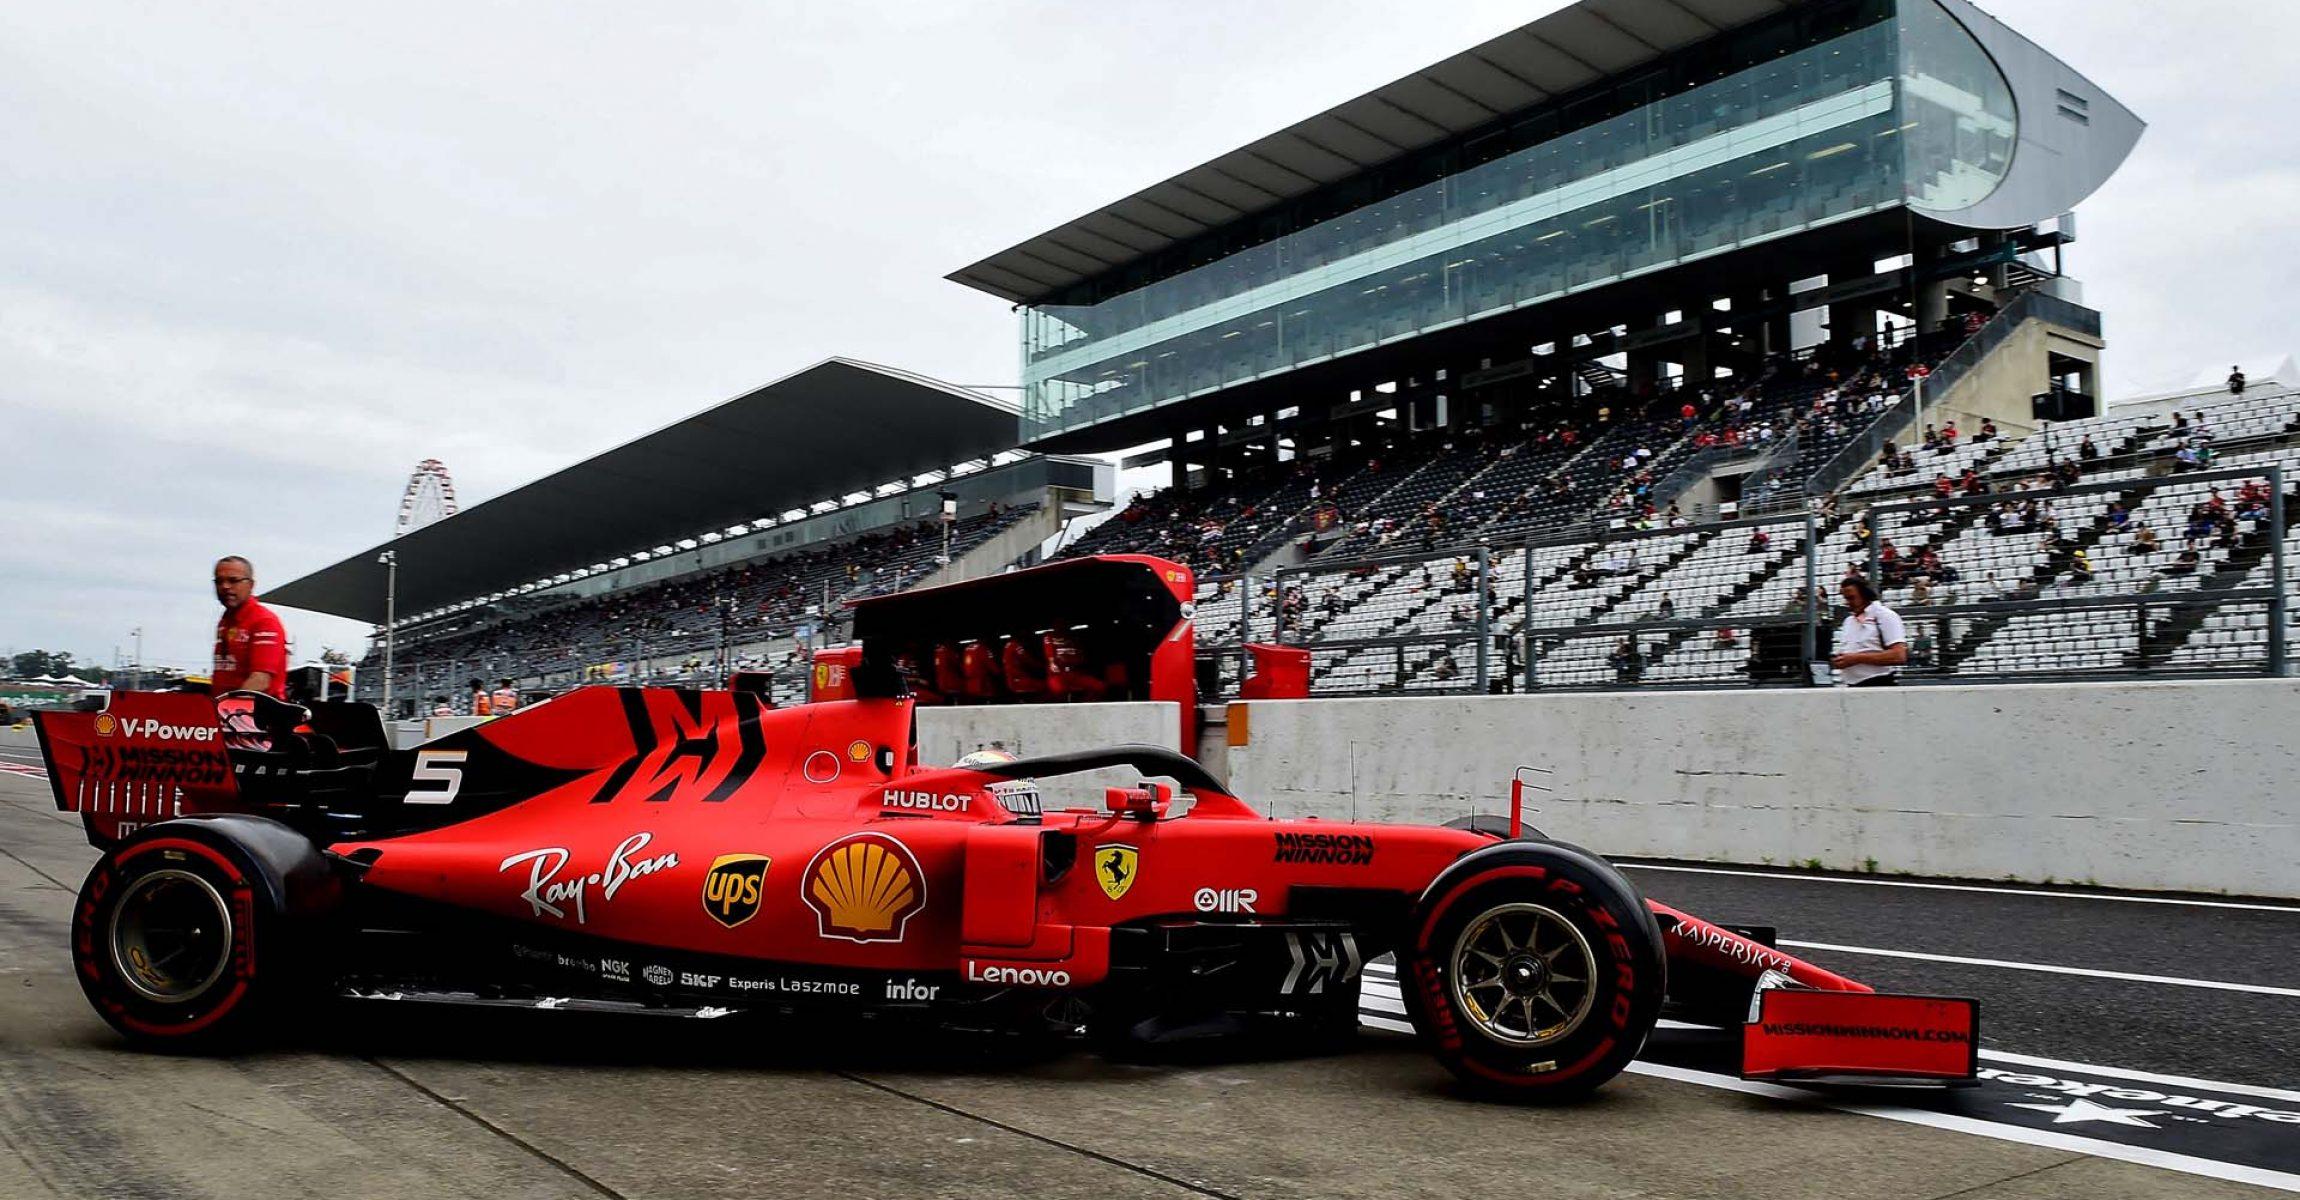 GP GIAPPONE F1/2019 -  VENERDÌ 11/10/2019   credit: @Scuderia Ferrari Press Office Sebastian Vettel, Ferrari